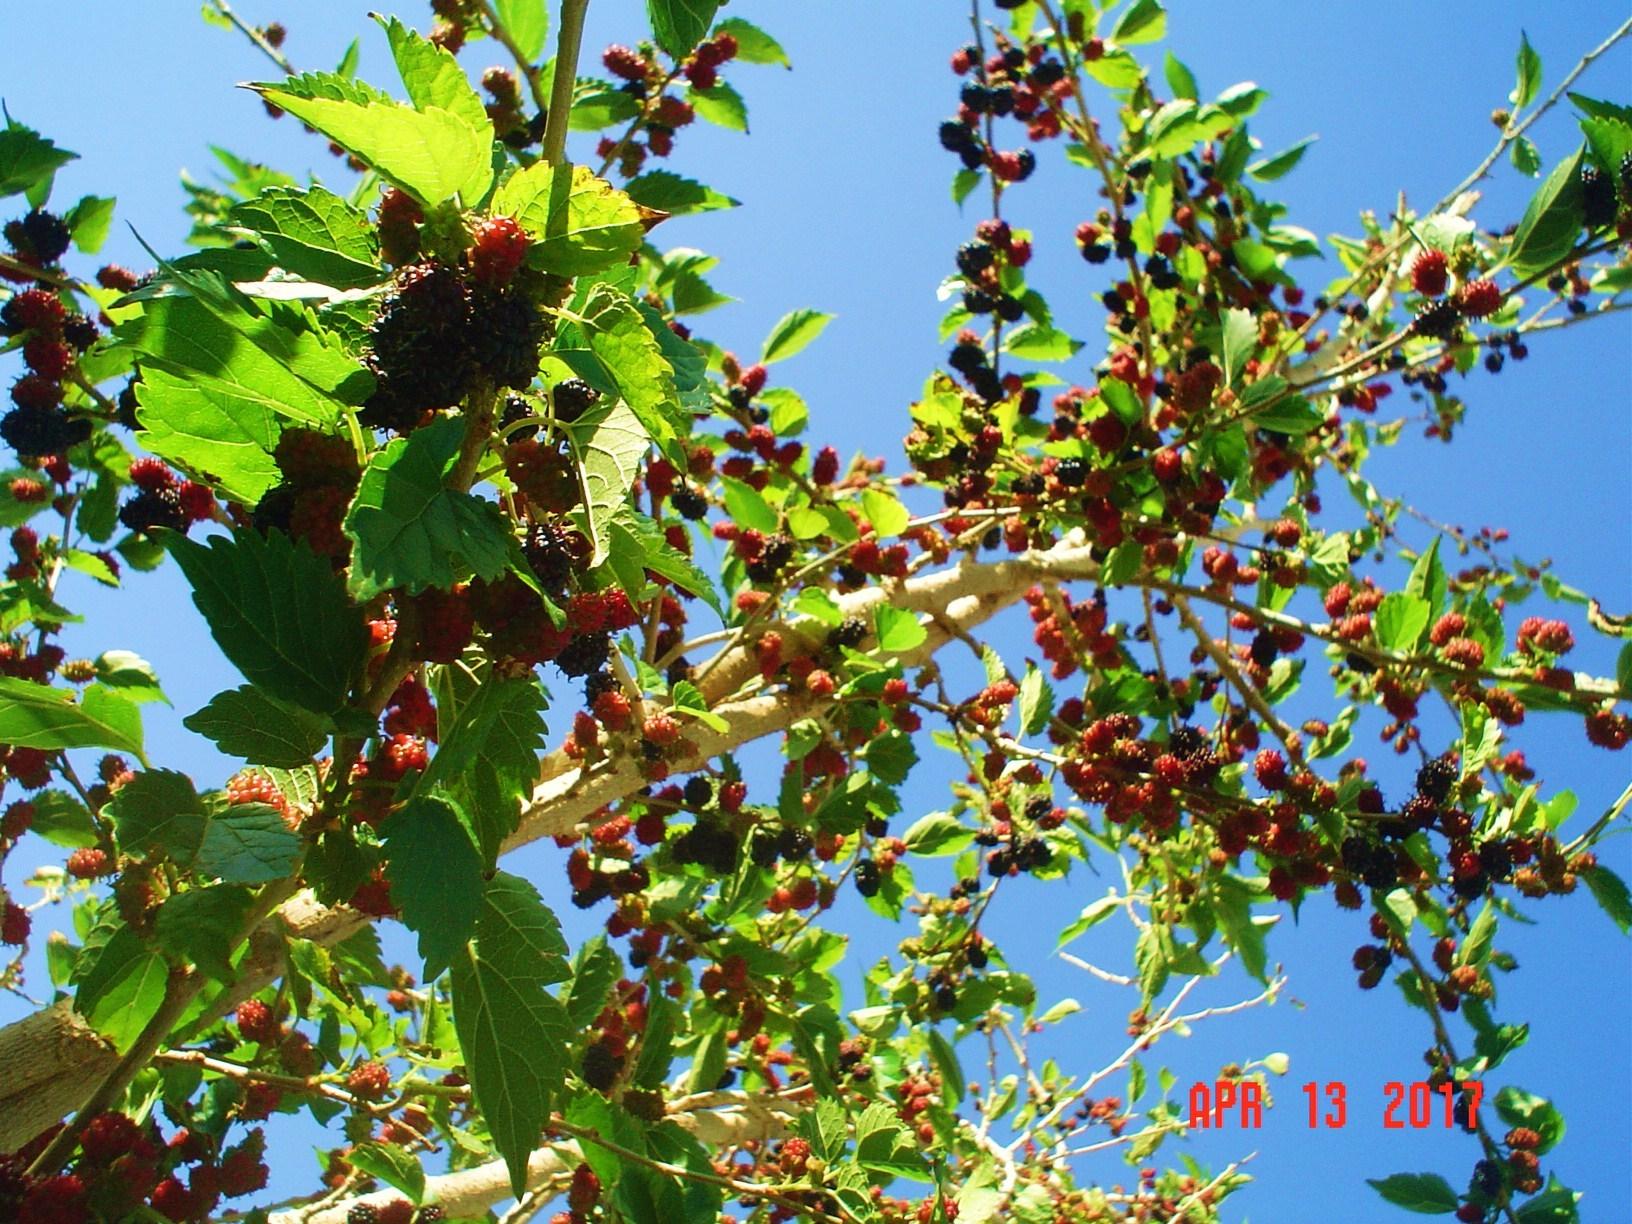 Dwarf everbearing mulberry m nigra general gardening growing dwarf everboringg1632x1224 572 kb sciox Image collections